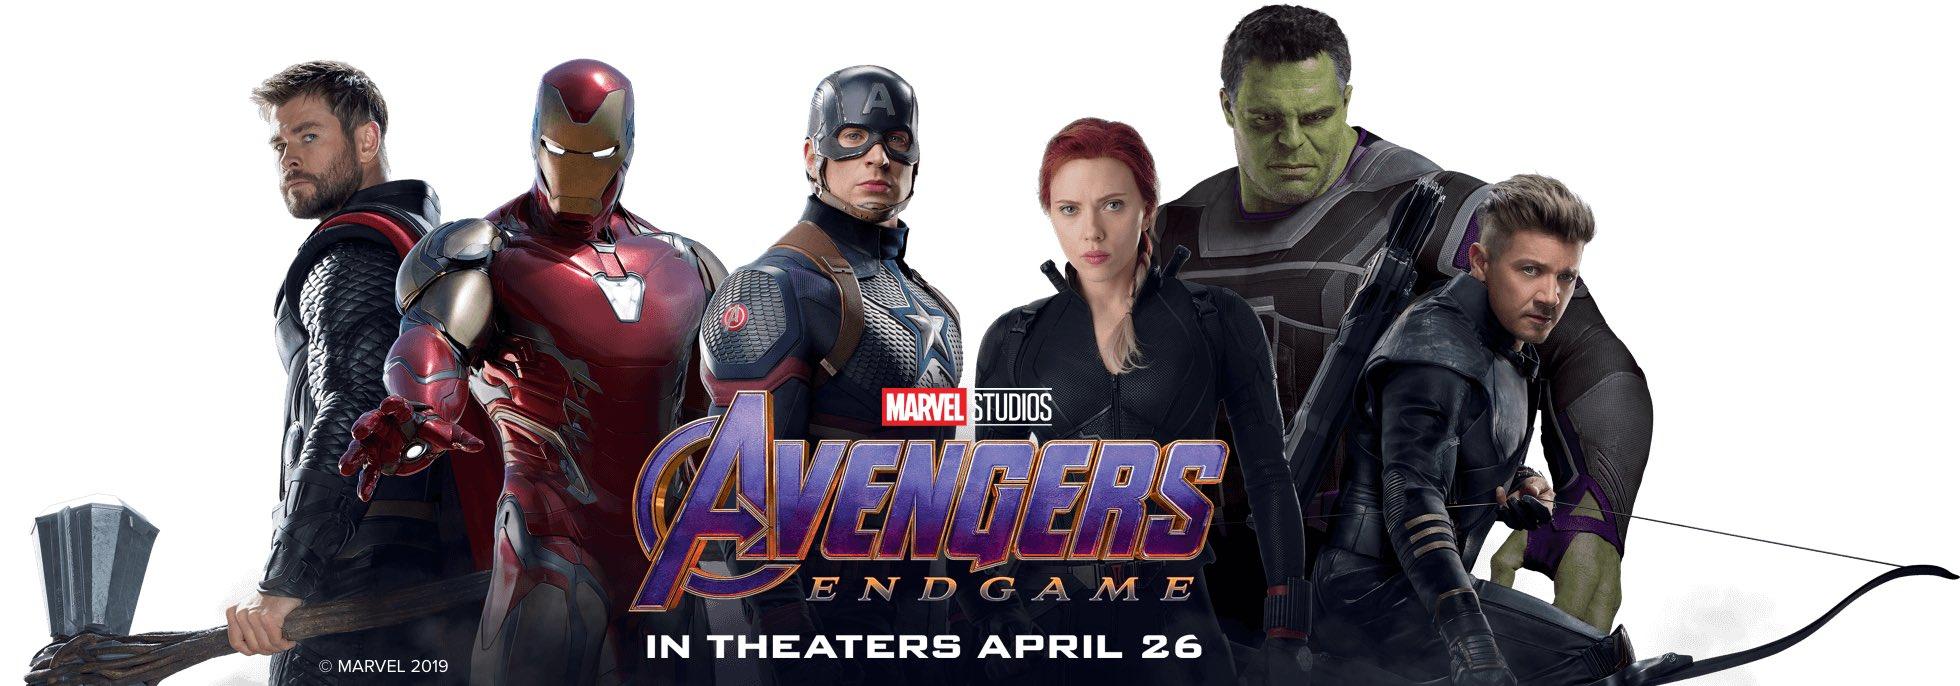 NEW: #AvengersEndgame Promo Photo via @Marvel_Freshman https://t.co/QwhUQWHYM8